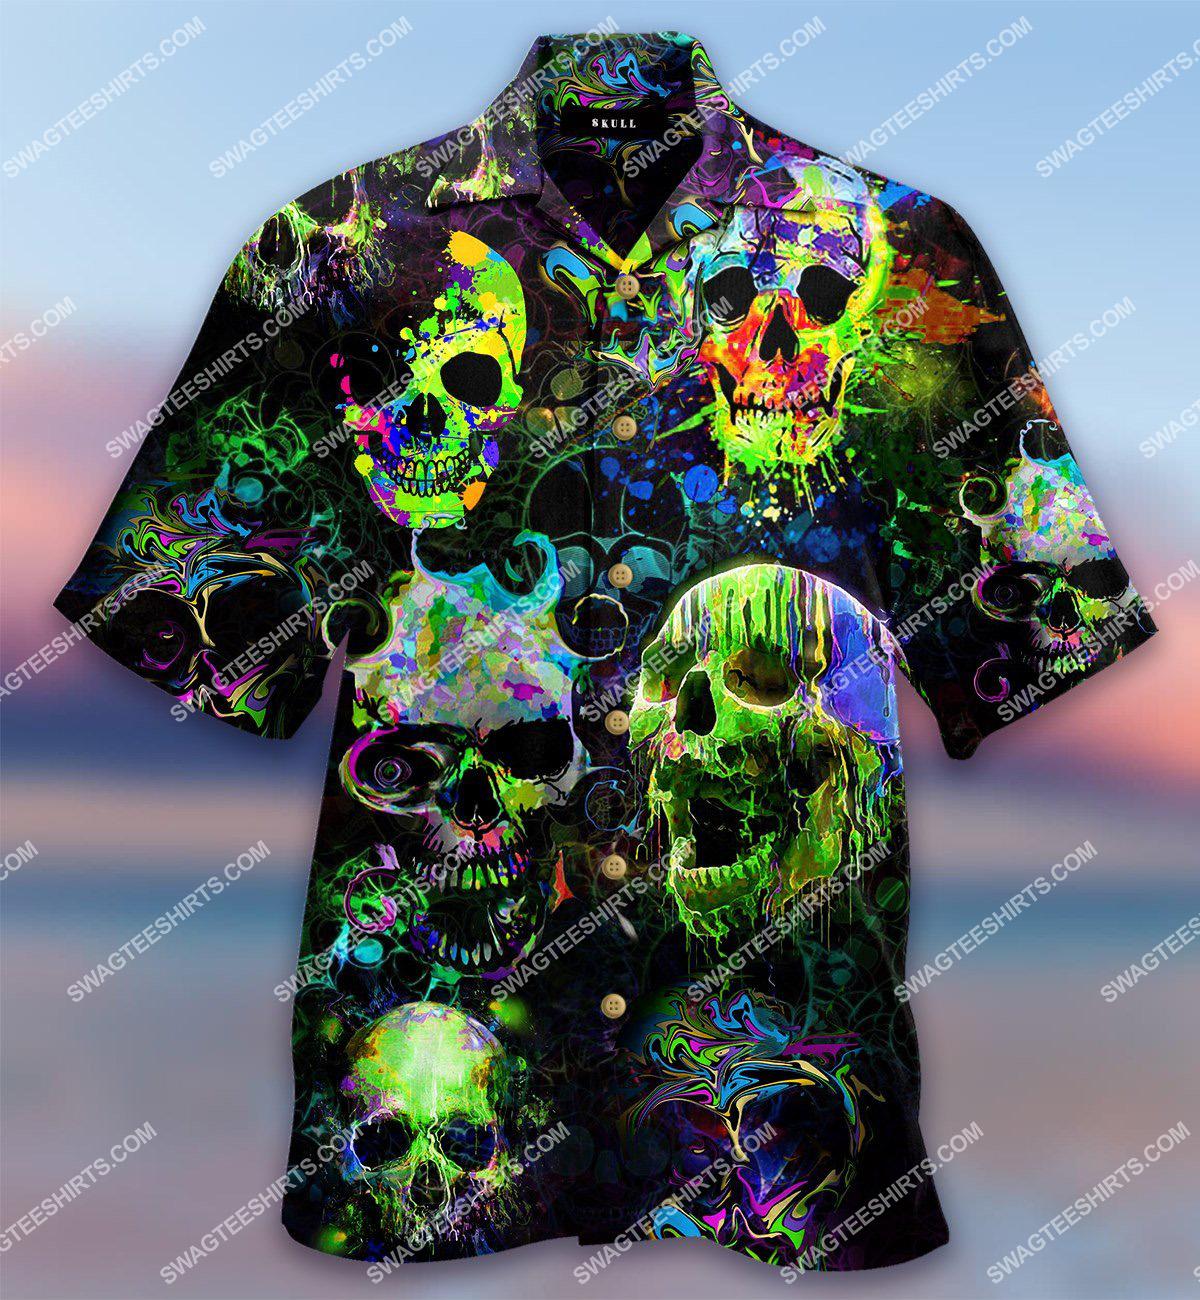 skull watercolor all over printed hawaiian shirt 1(1) - Copy